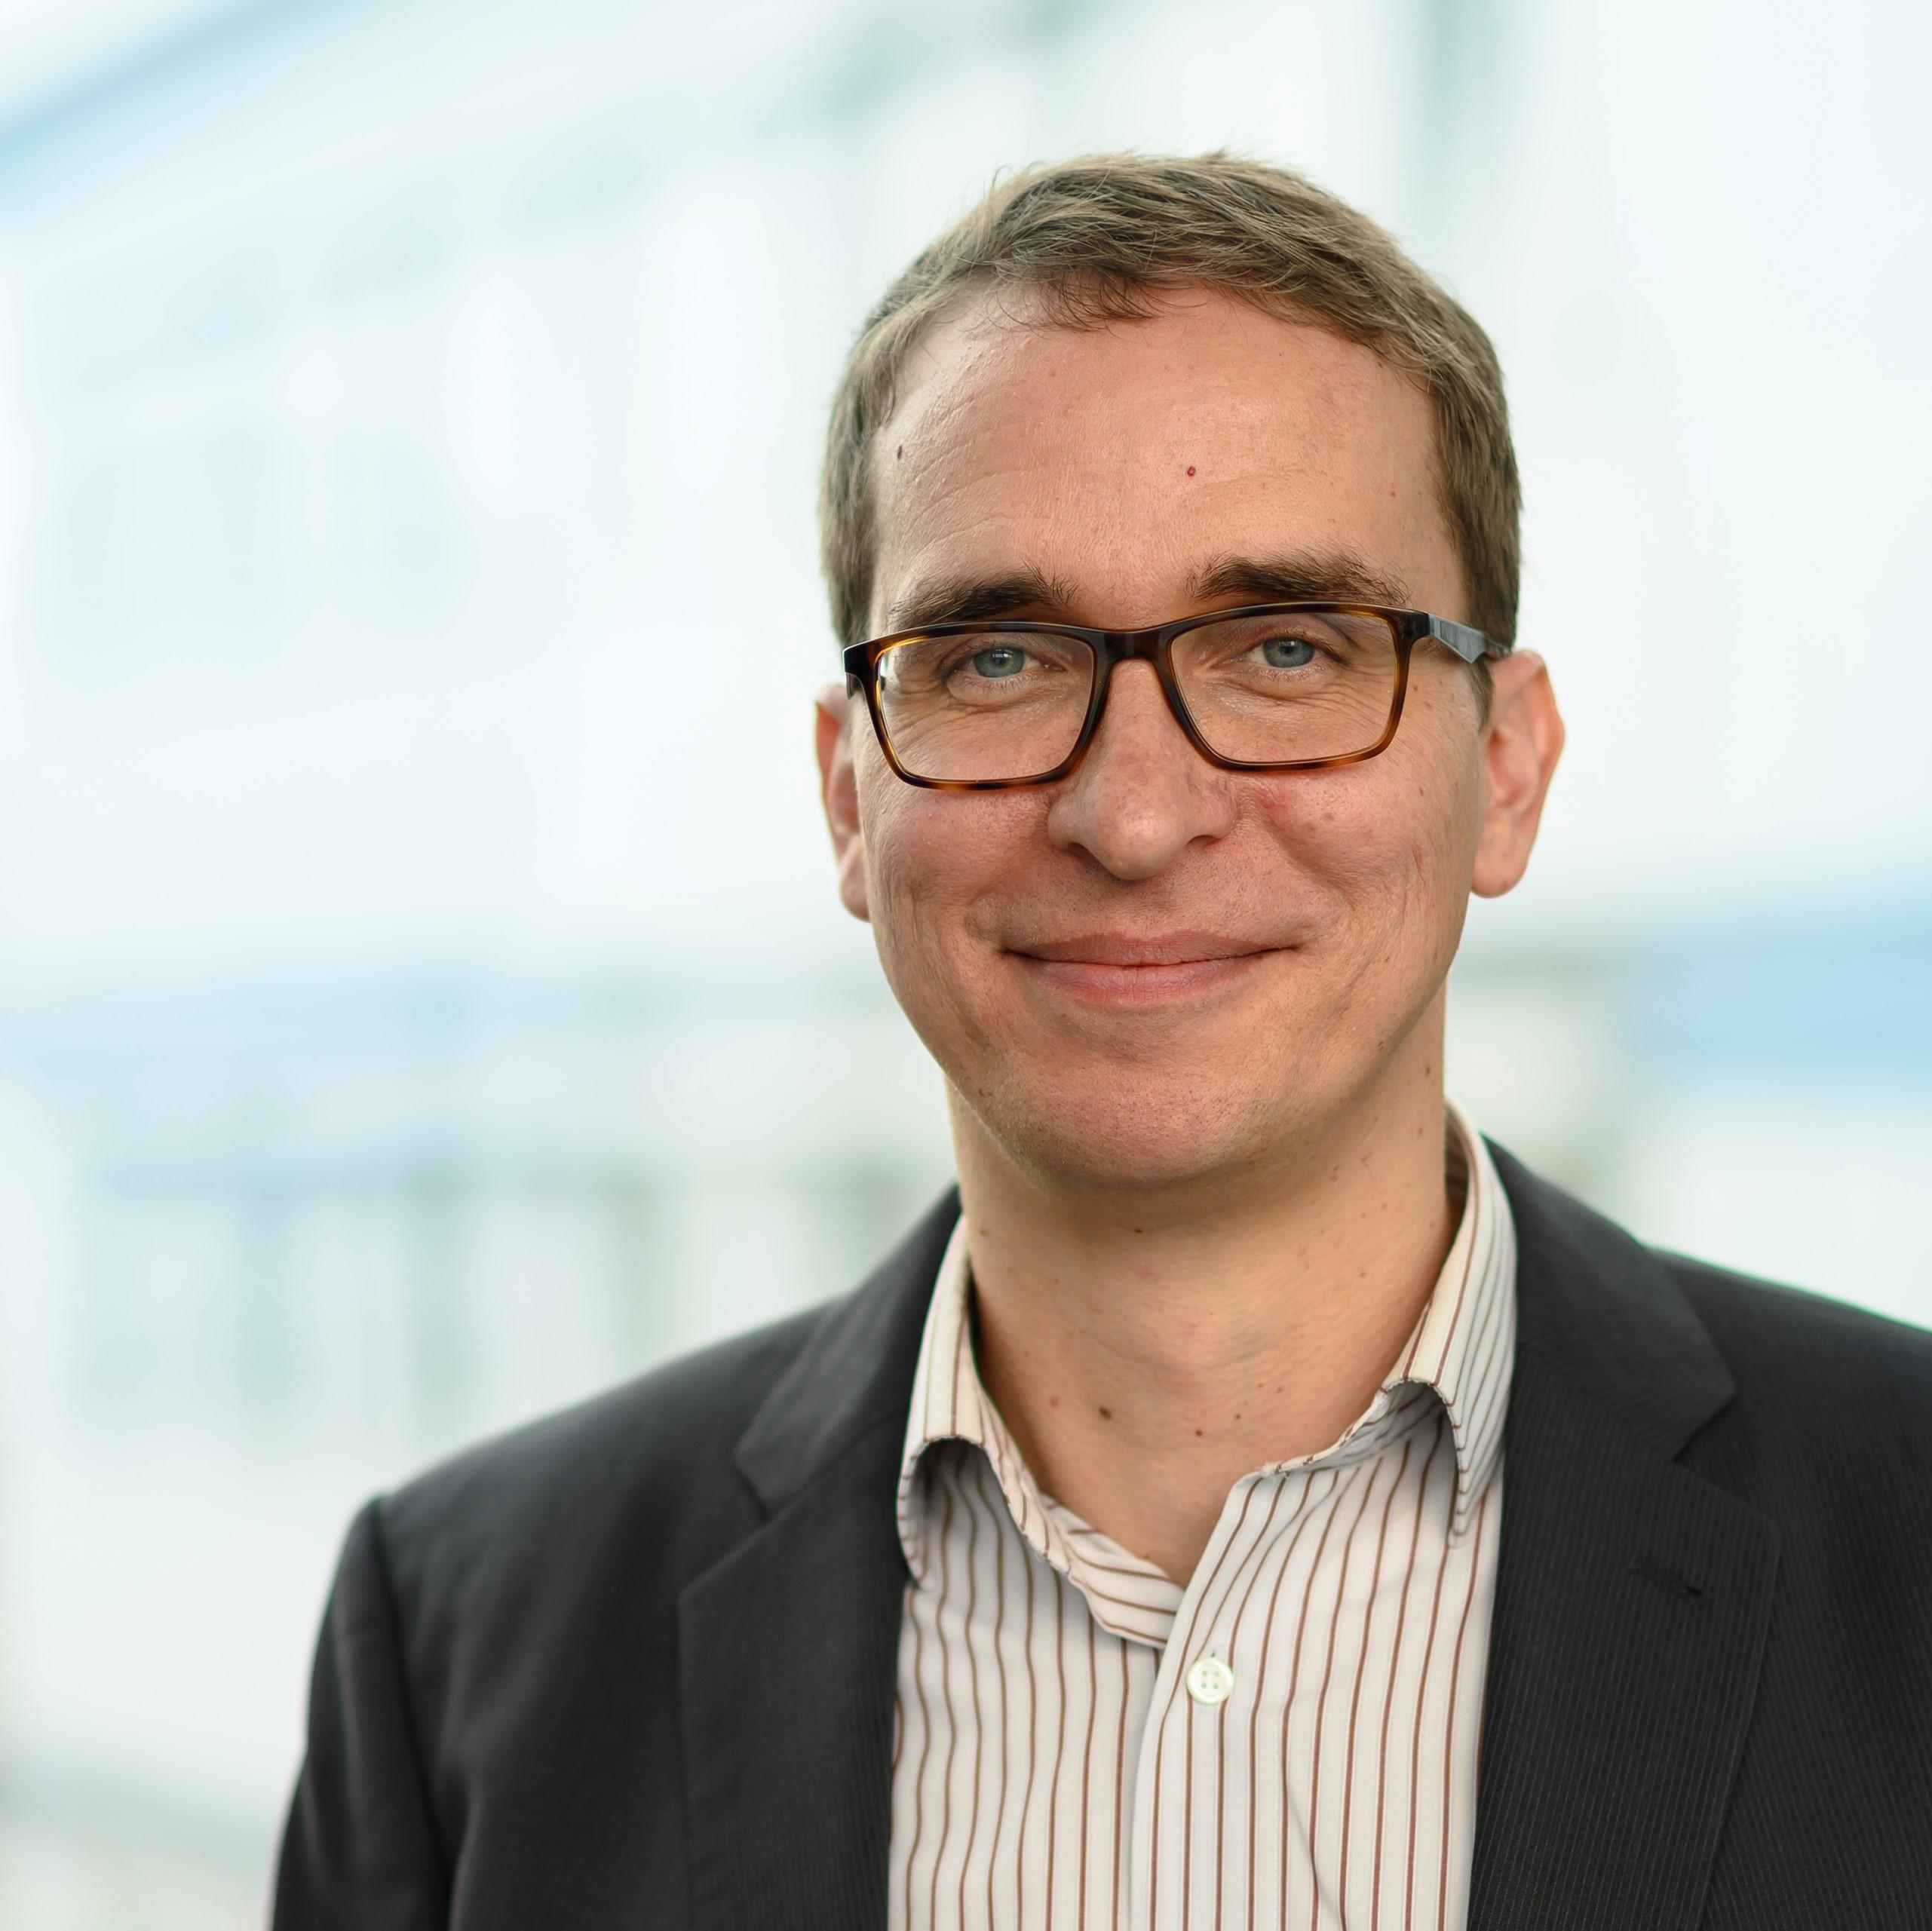 Christian Dittmar Fraunhofer IIS